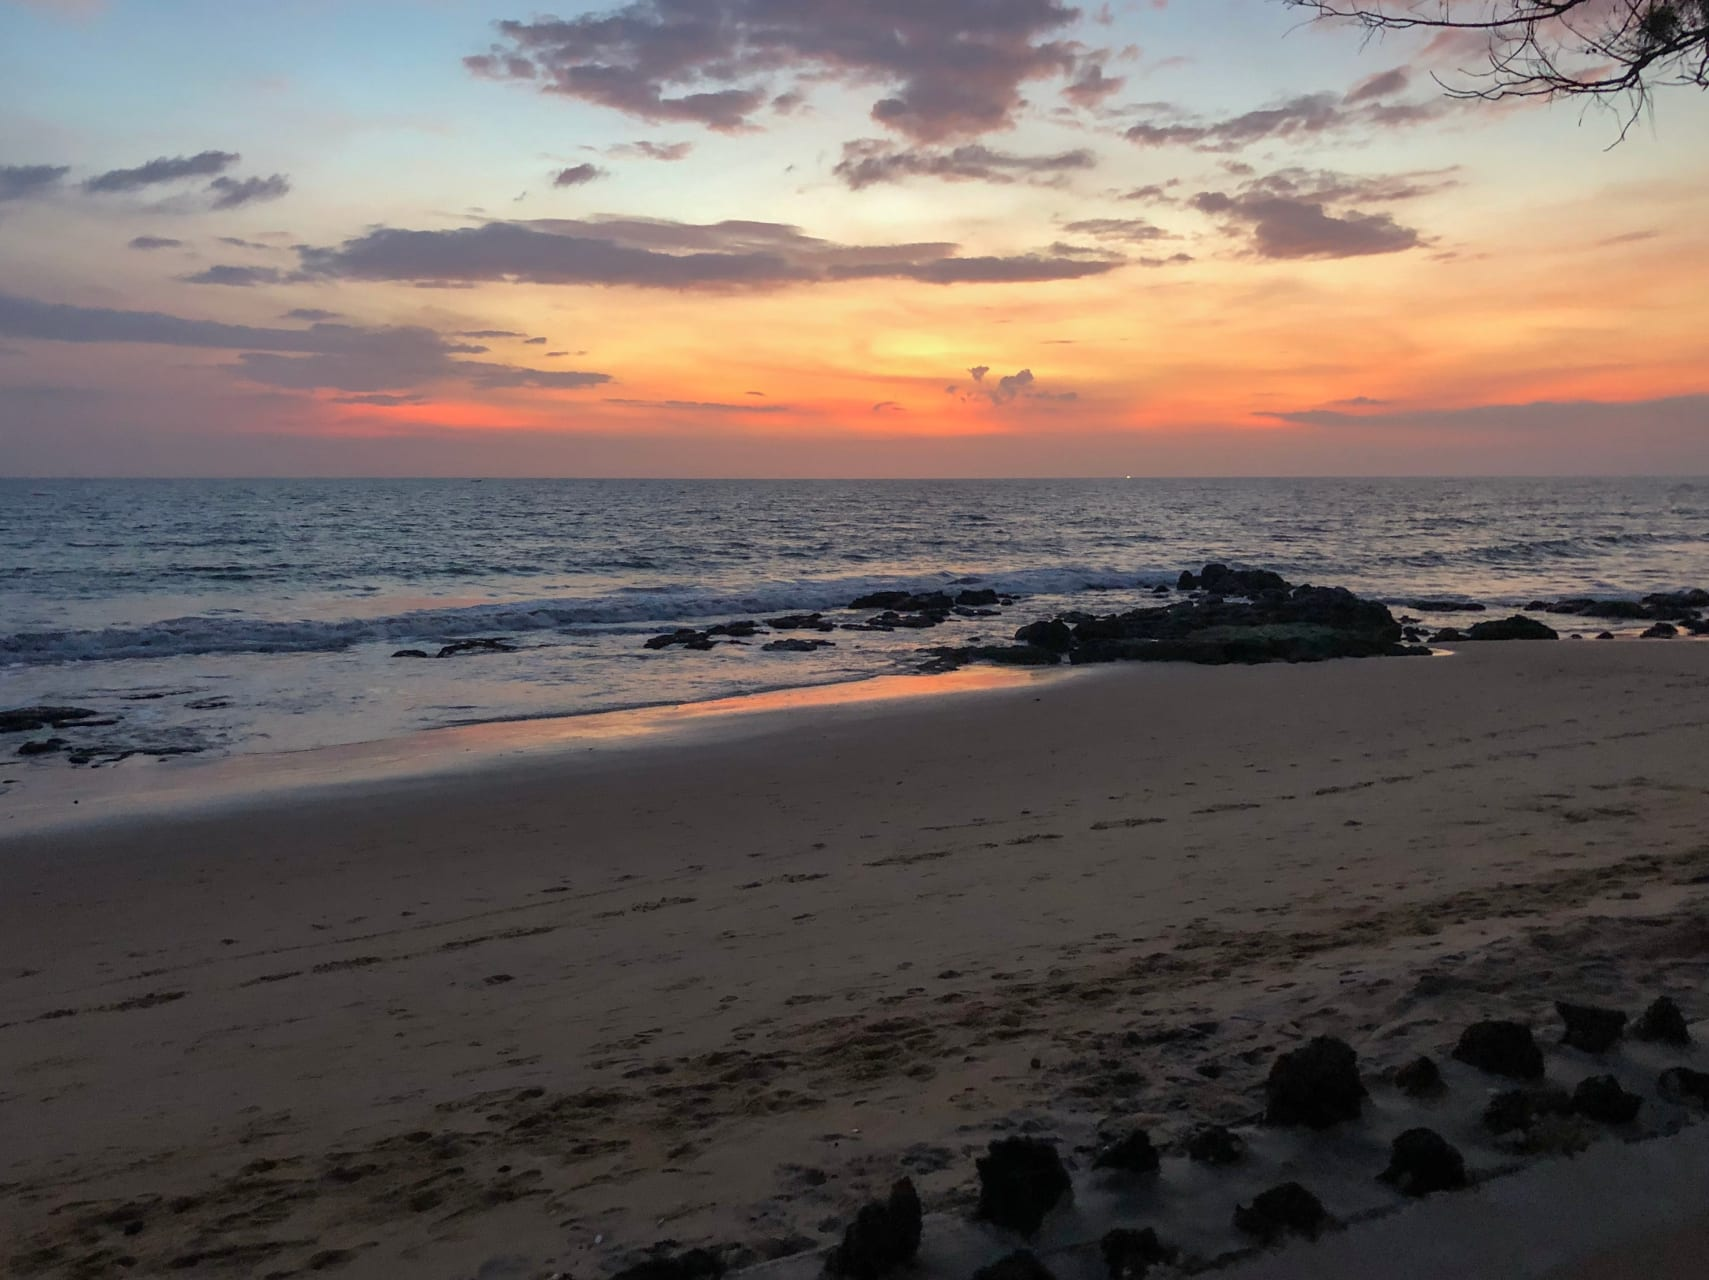 Dakar - Sunset in Ngaparou, a Traditional Village of Fishermen